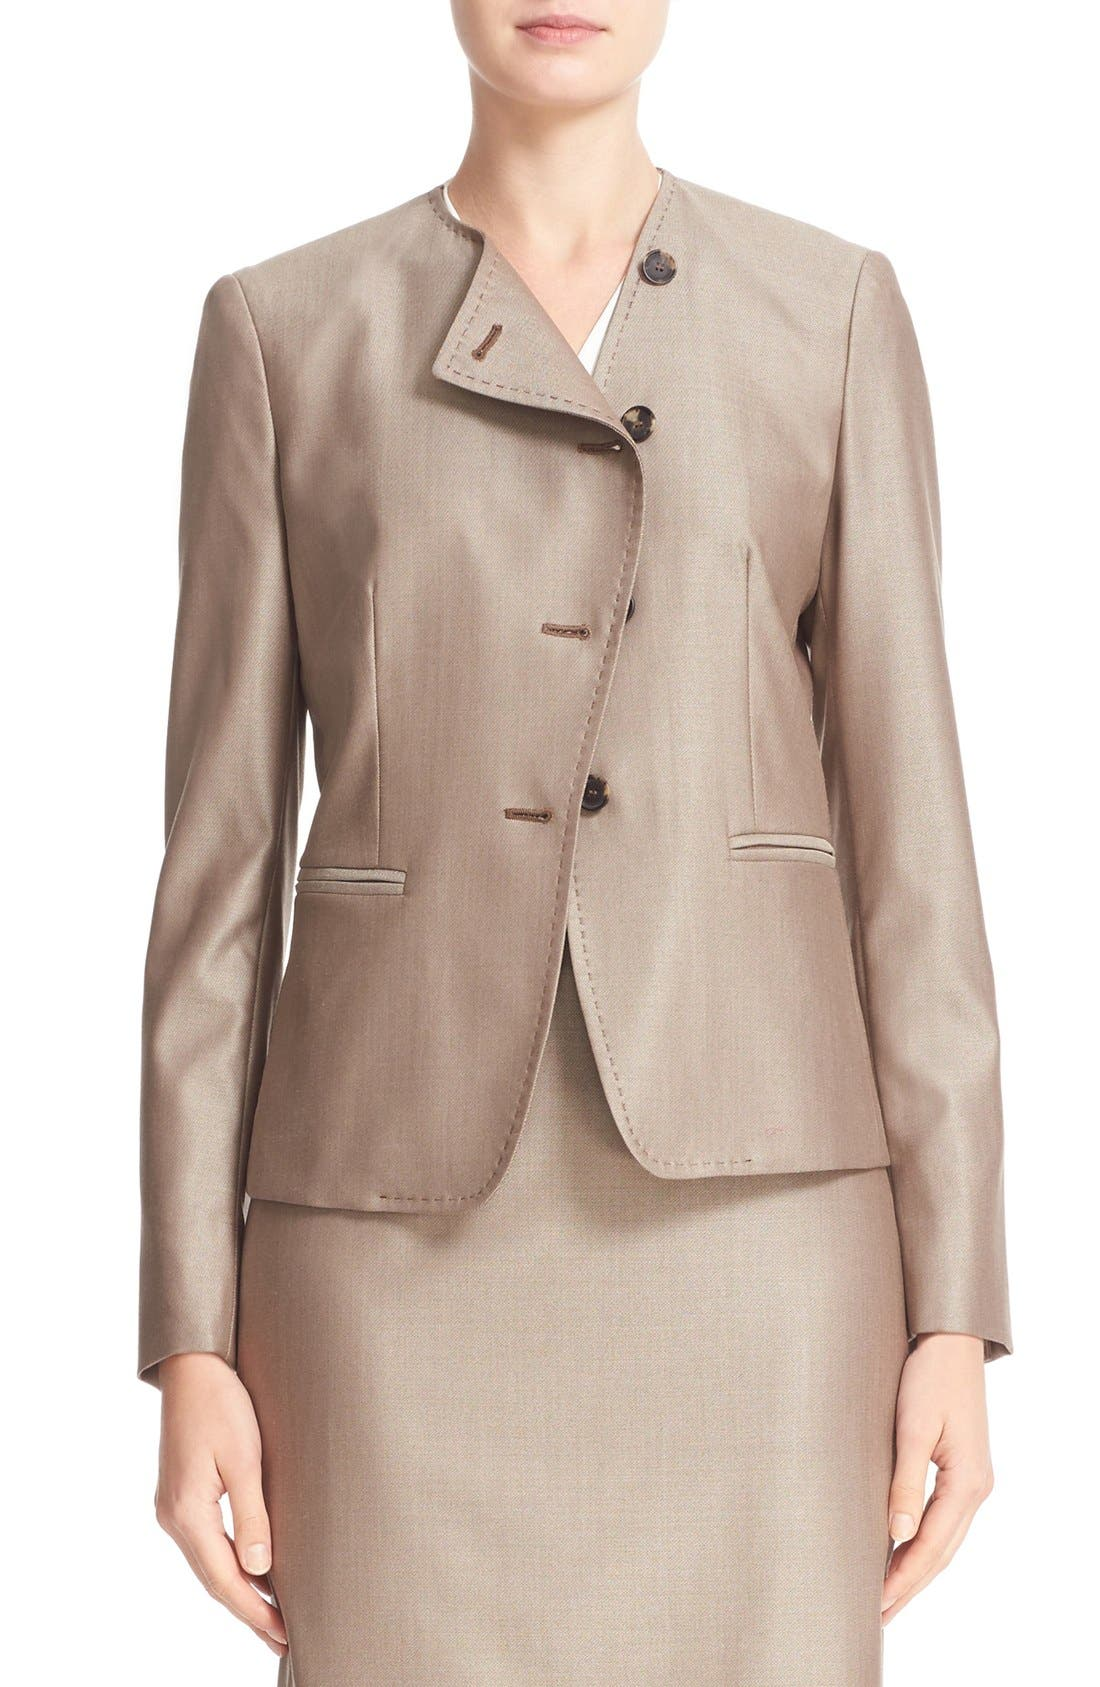 Erba Asymmetrical Jacket,                             Main thumbnail 1, color,                             220